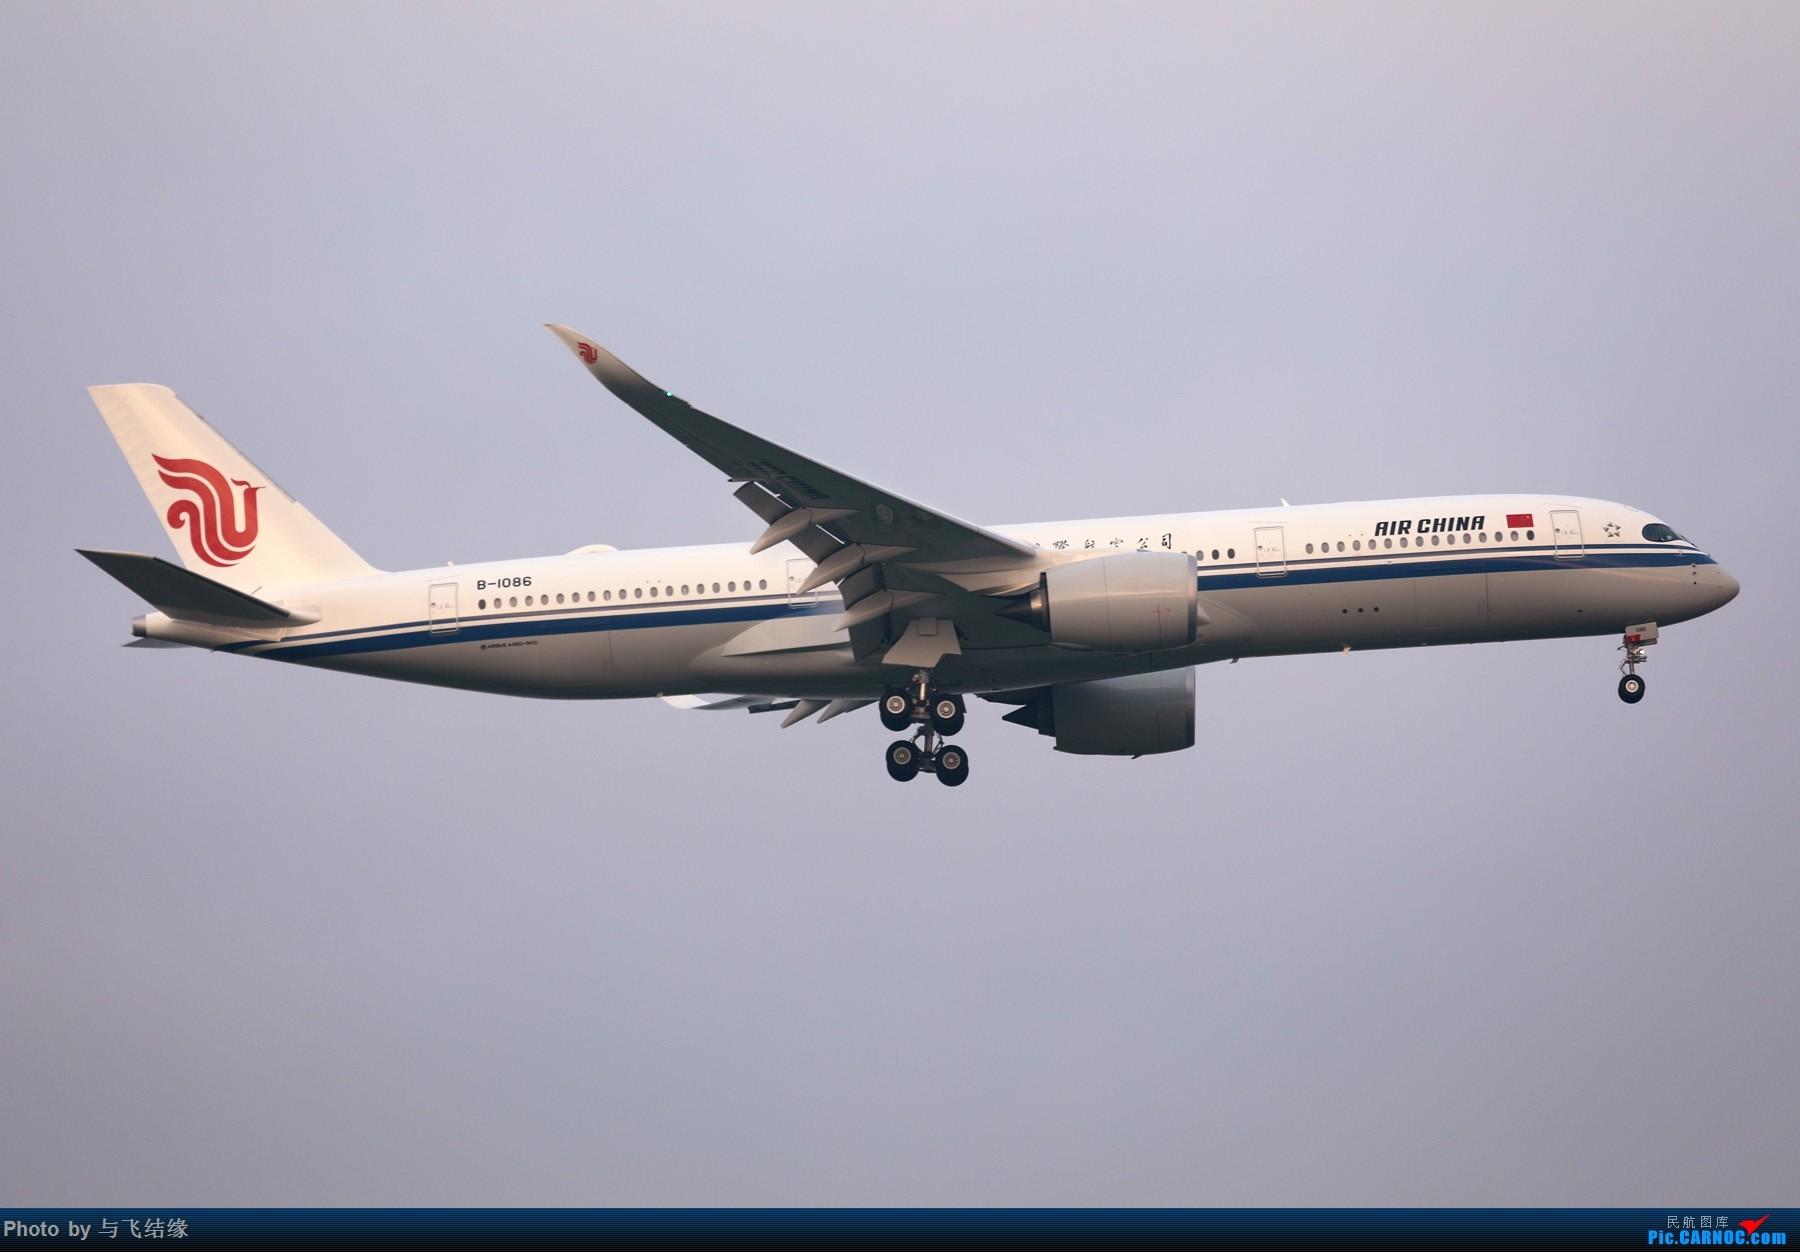 "Re:[原创]国航今日喜提崭新的airbus a350-900""墨镜侠""B-1086. AIRBUS A350-900 B-1086 中国北京首都国际机场"